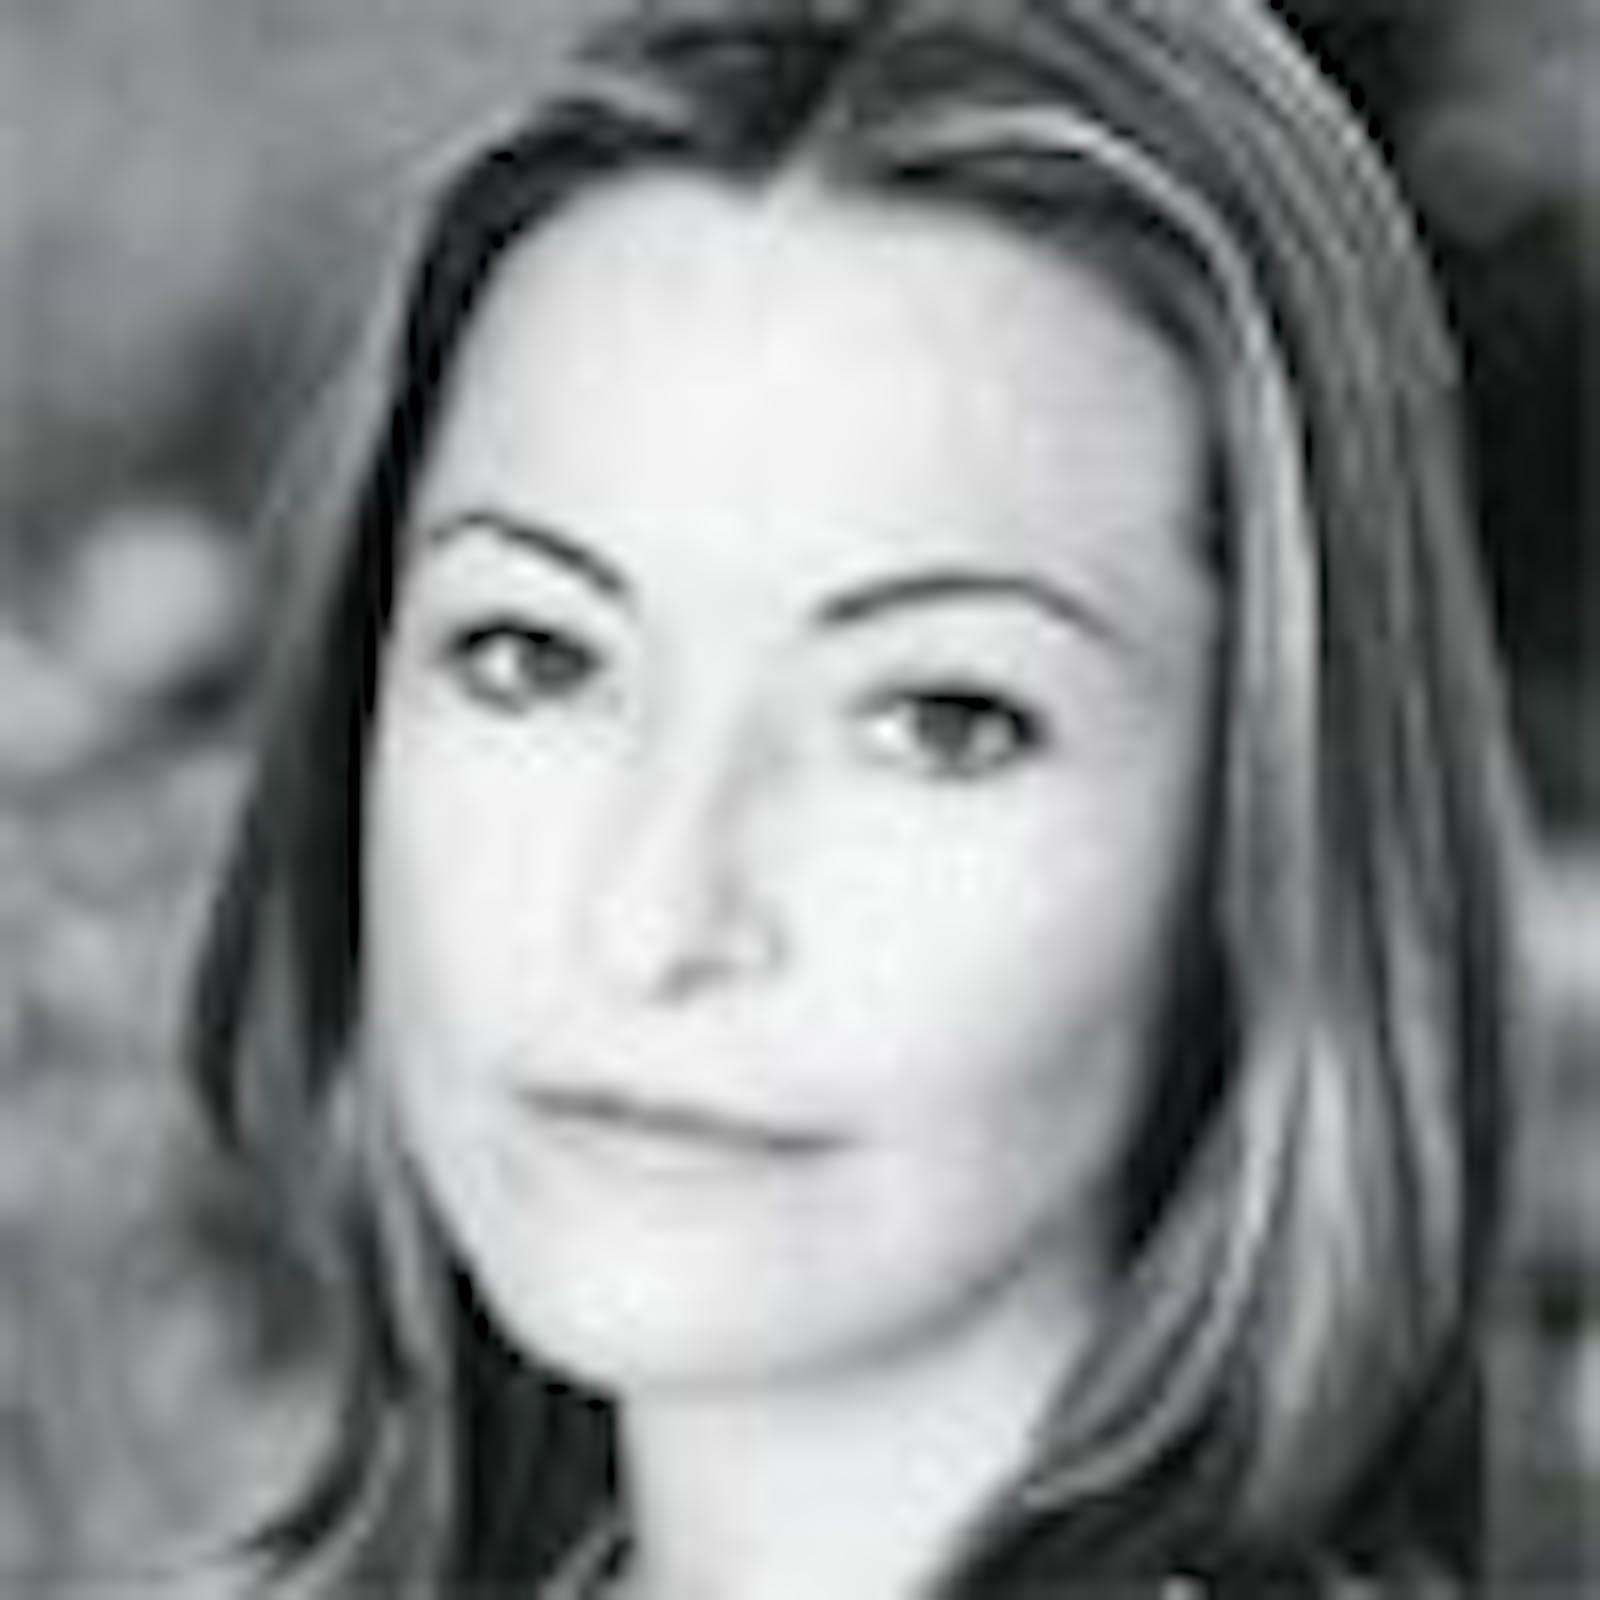 Amanda Donohoe Pics amanda donohoe · bifa · british independent film awards